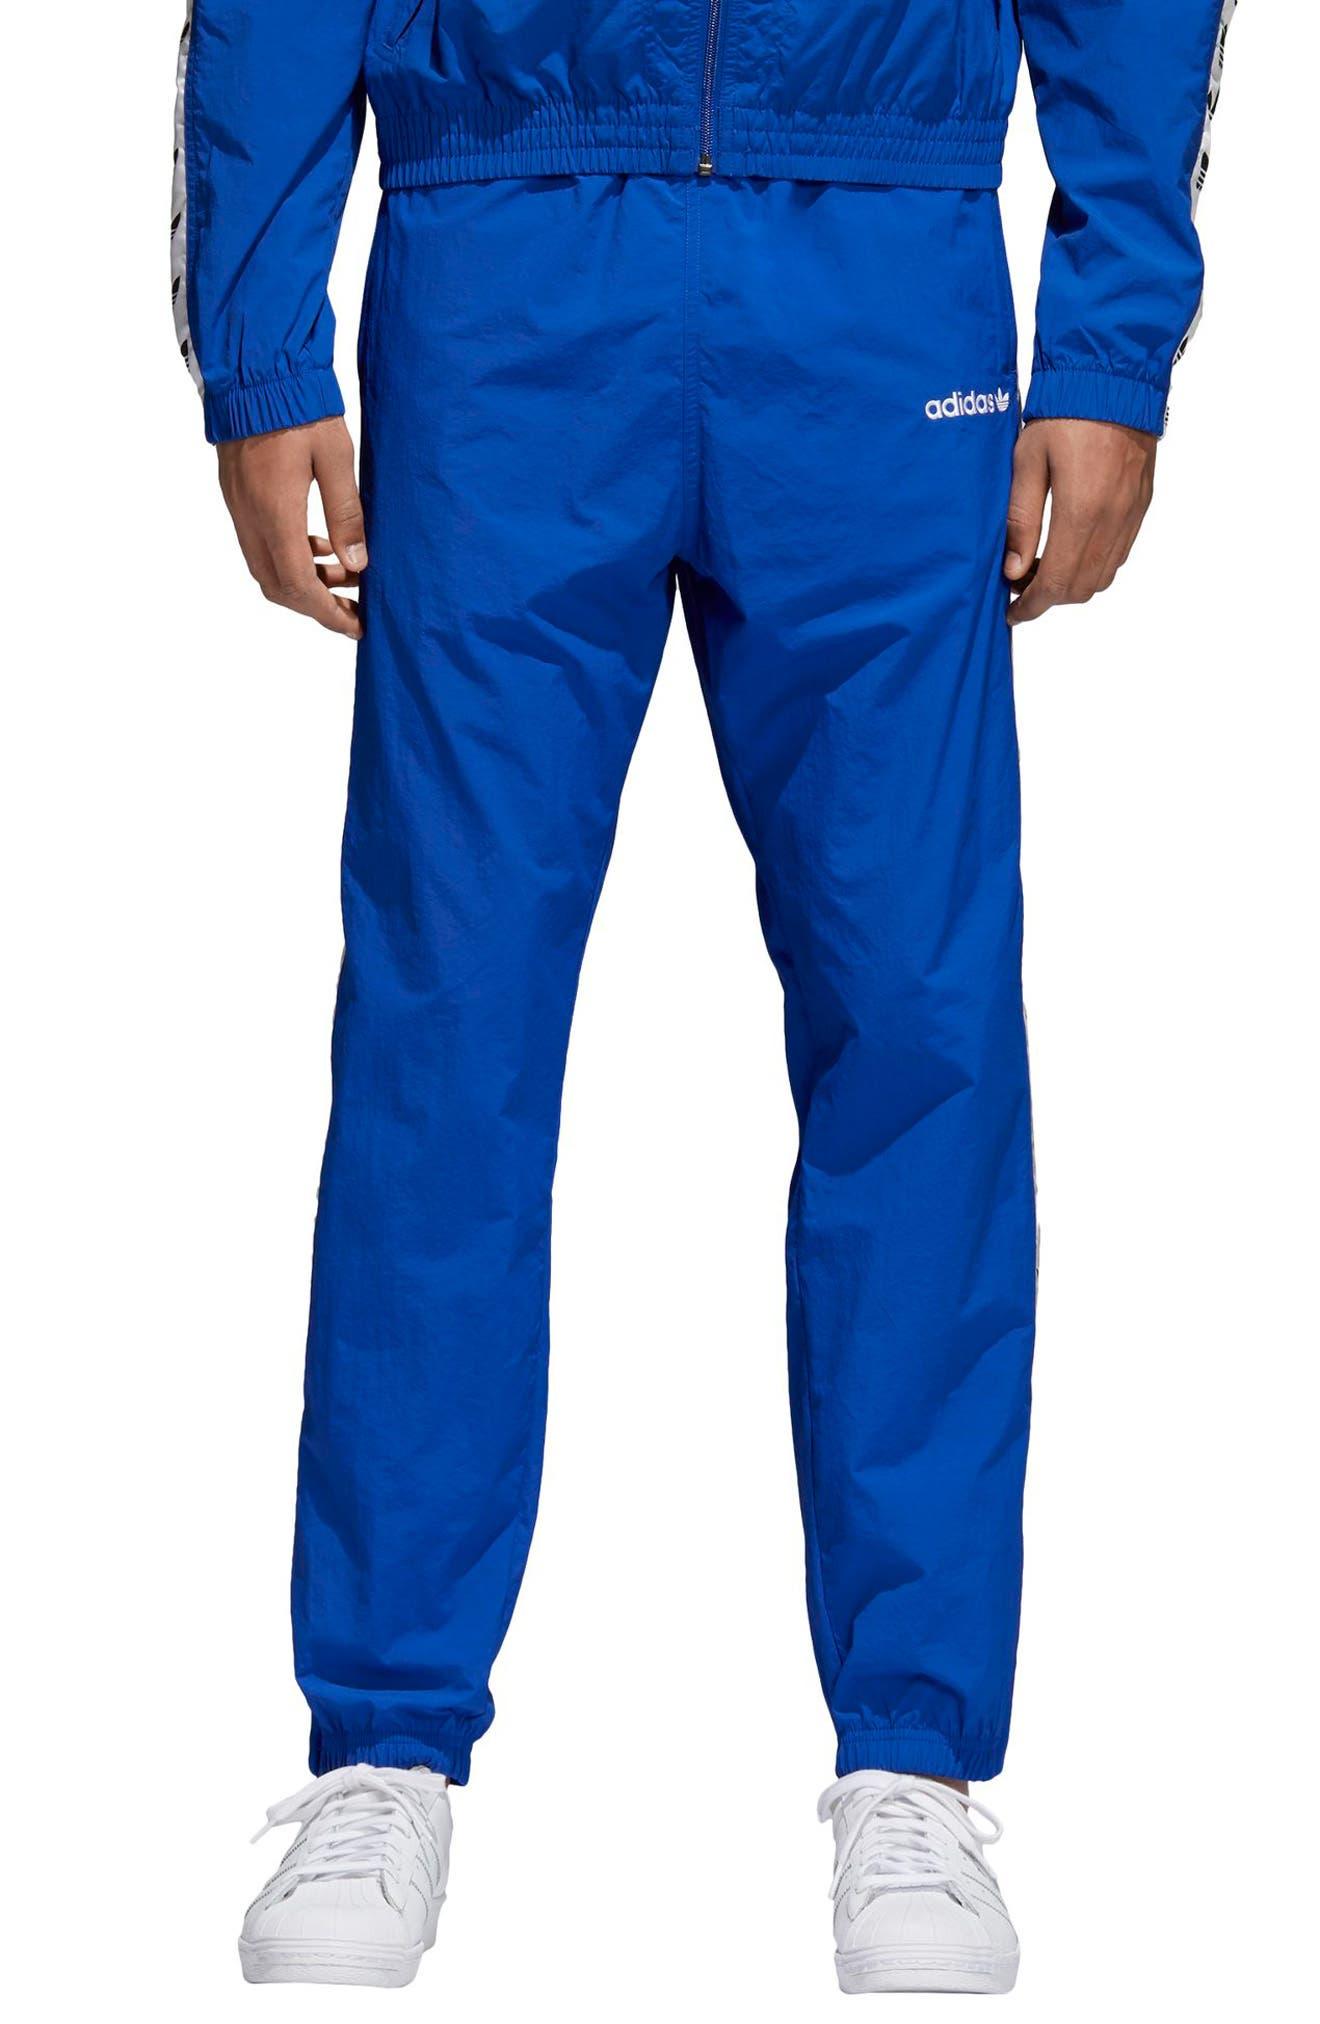 adidas Originals TNT Wind Pants